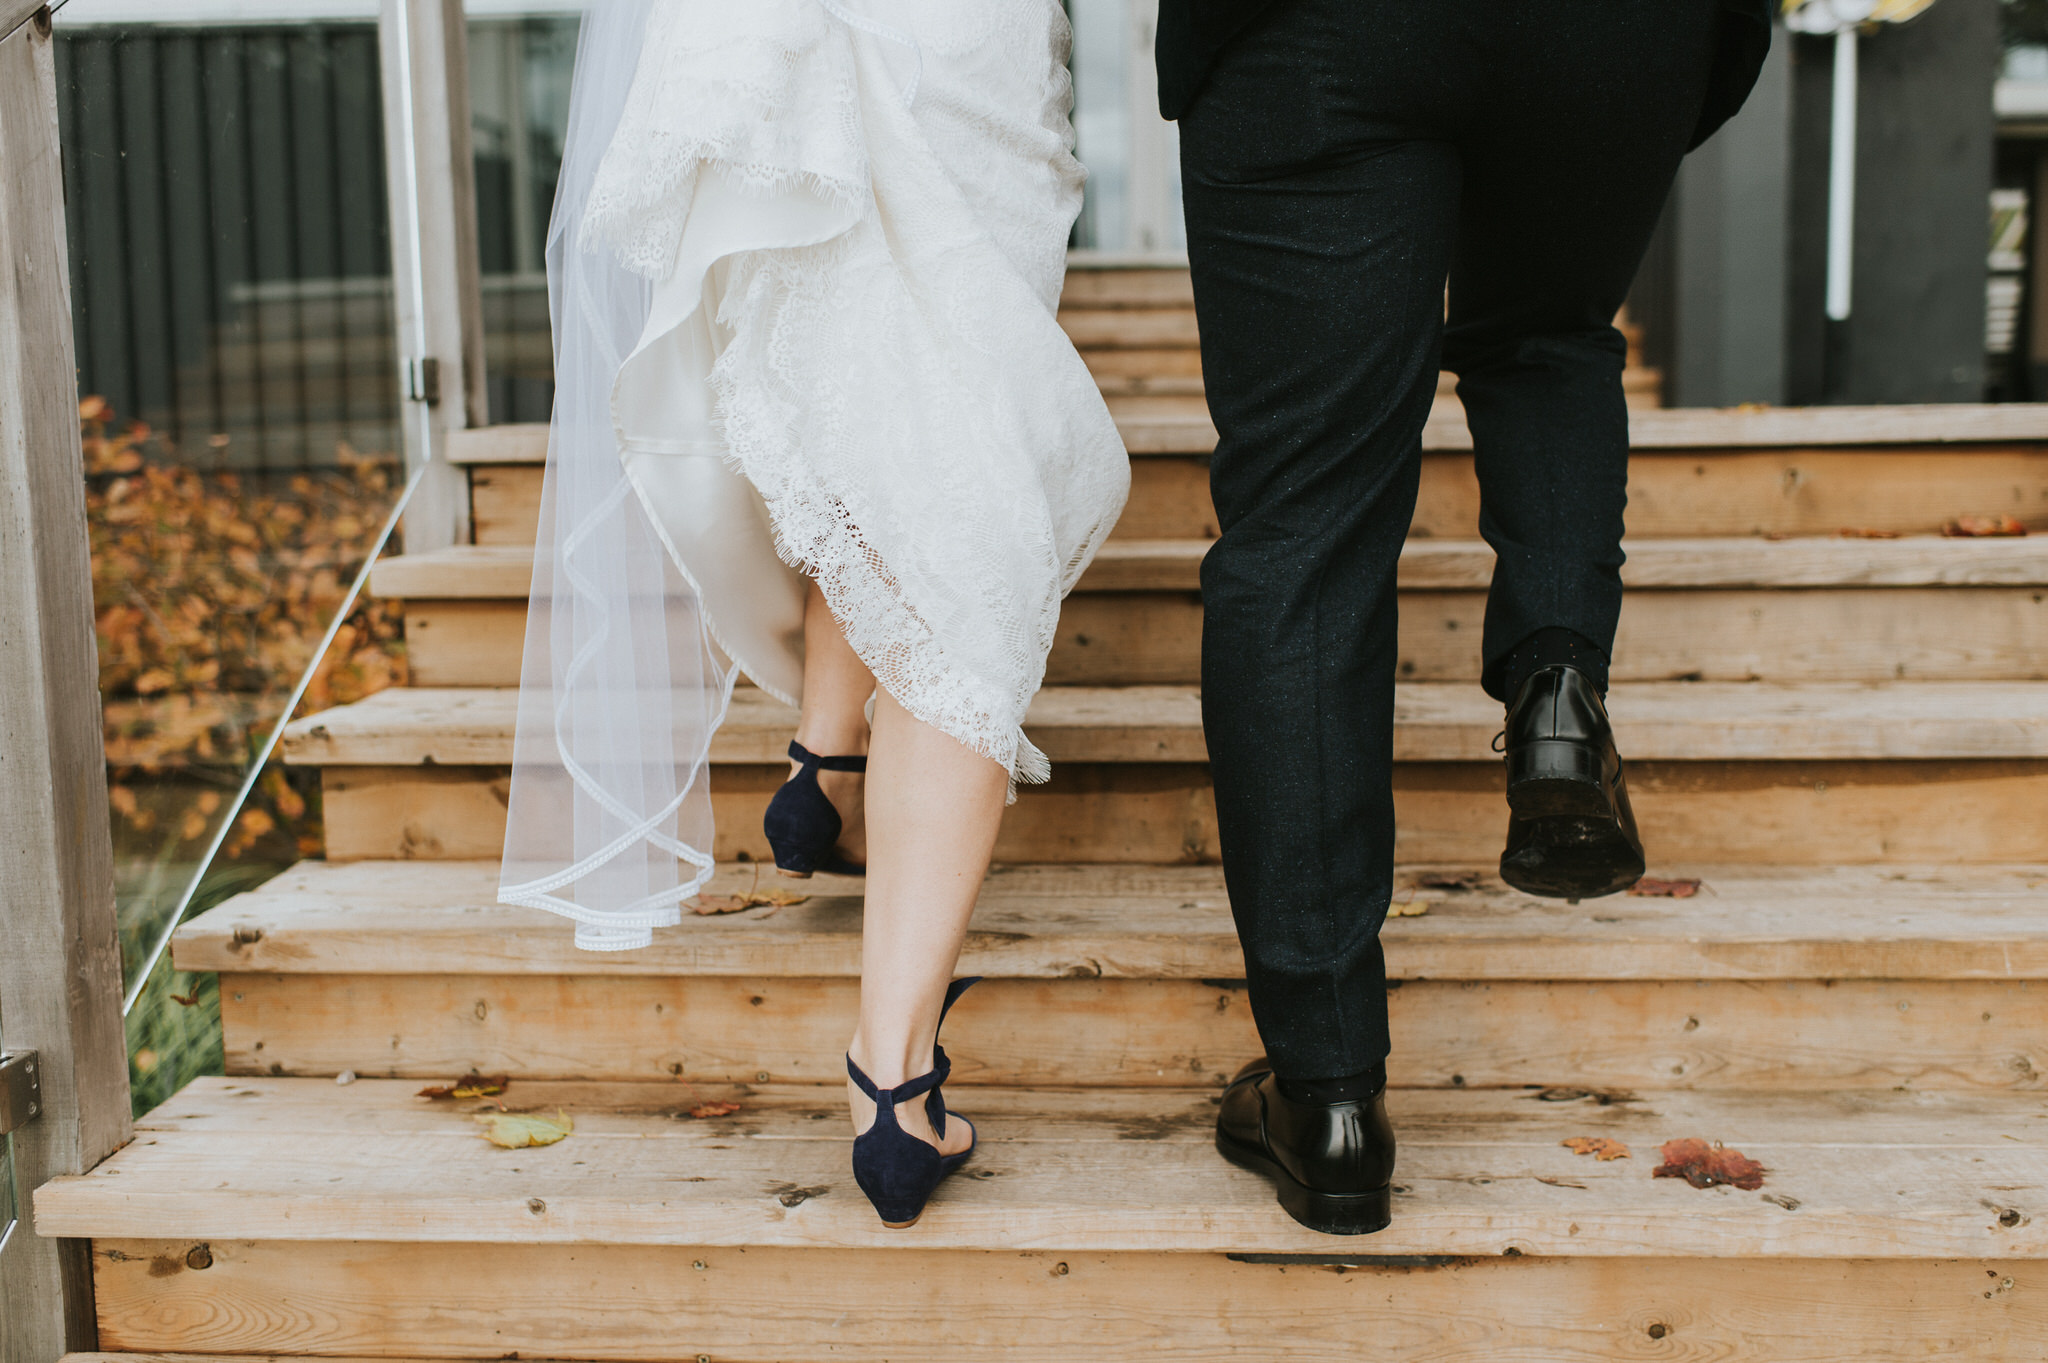 scarletoneillphotography_weddingphotography_prince edward county weddings045.JPG